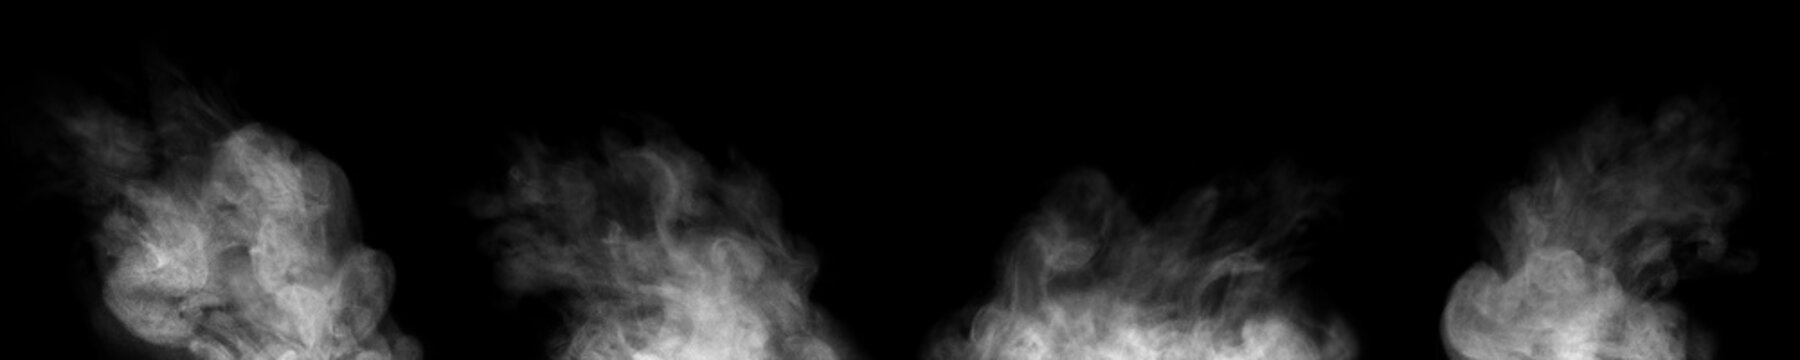 smoke steam isolated black background